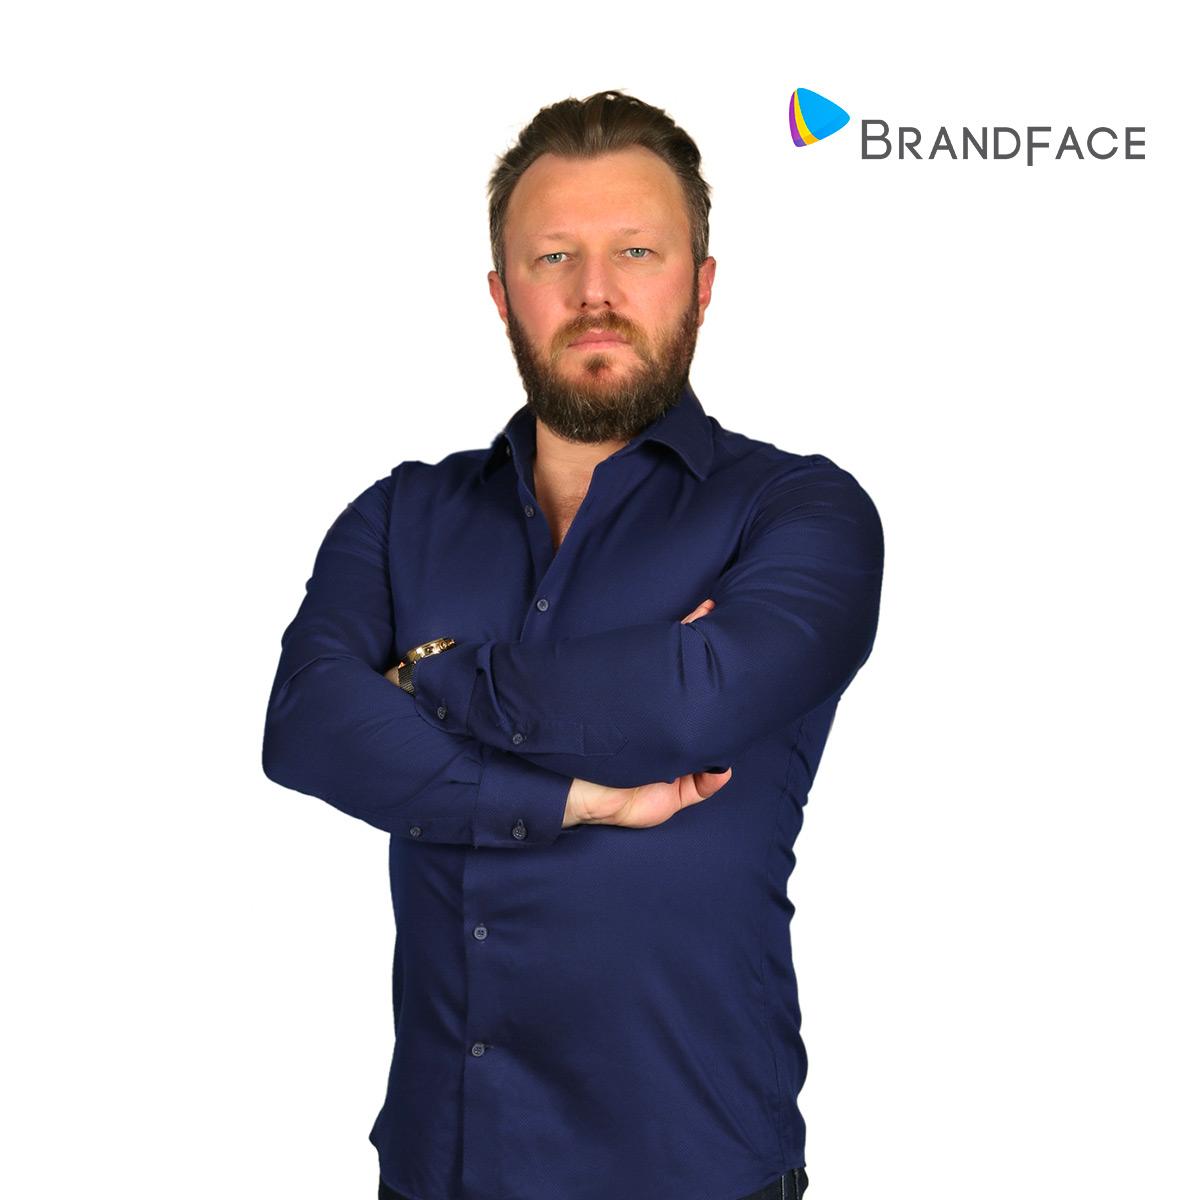 brandface